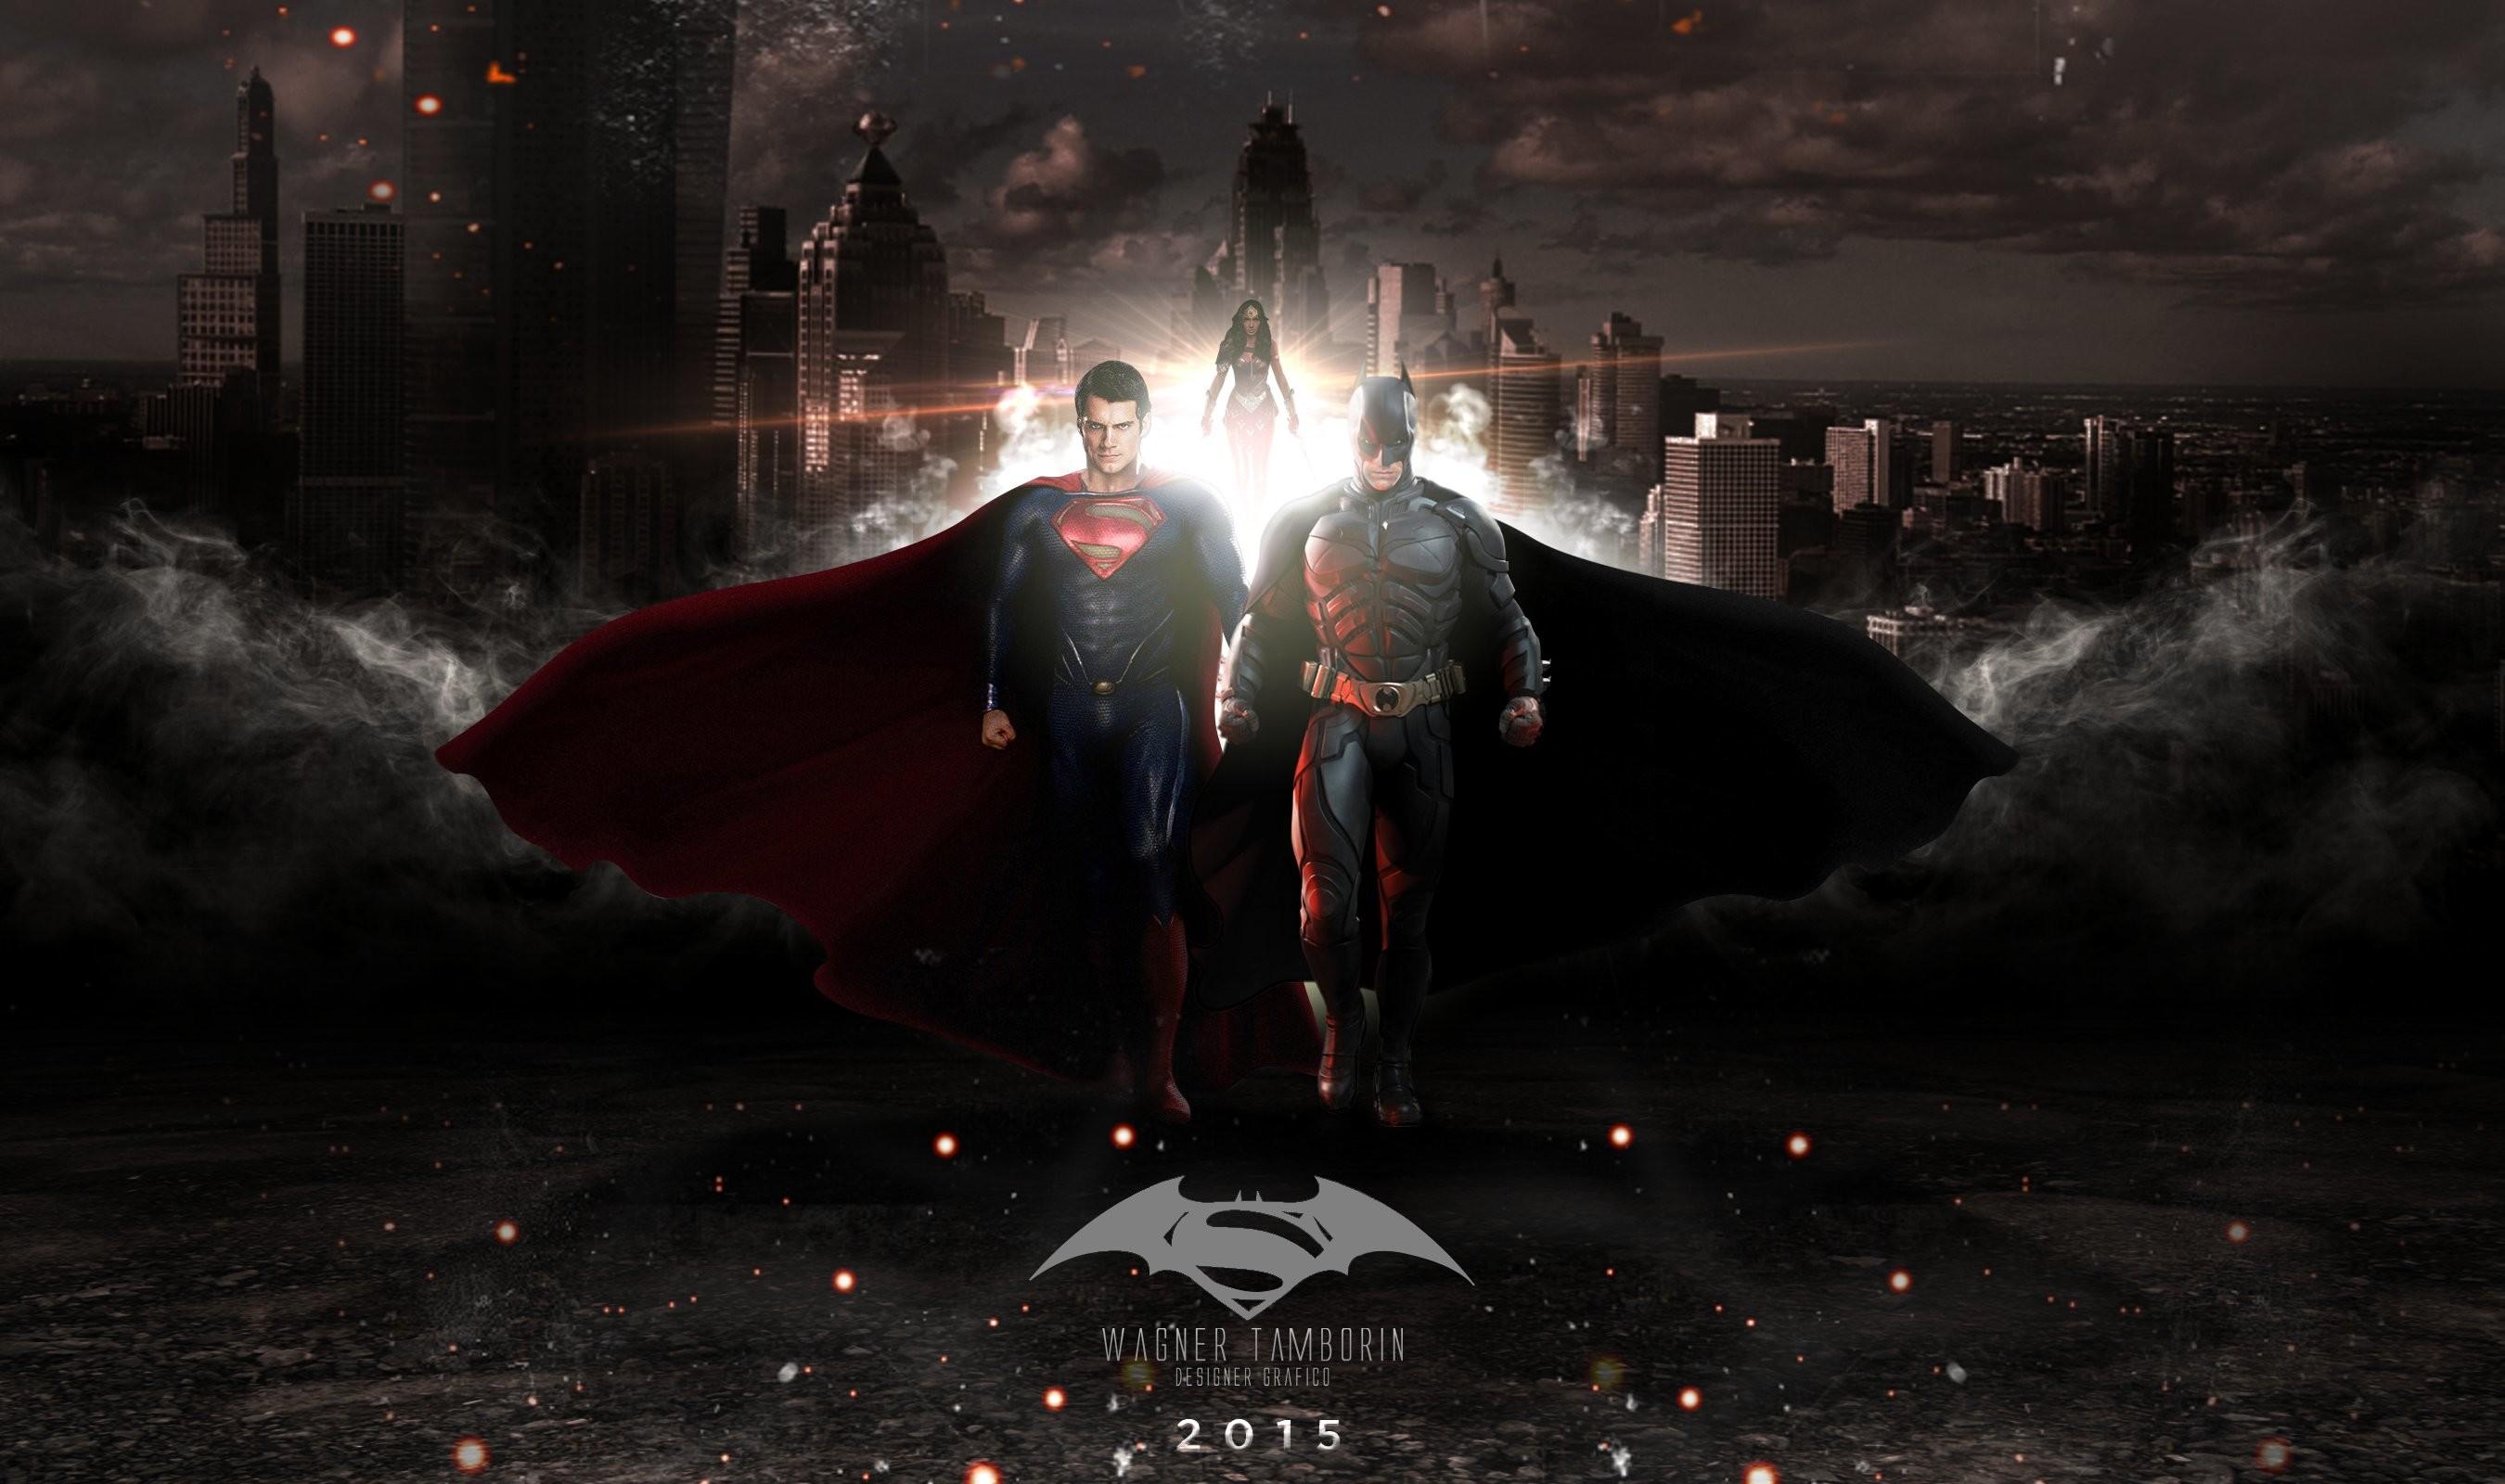 Res: 2700x1600, Batman v Superman: Dawn of Justice Pictures